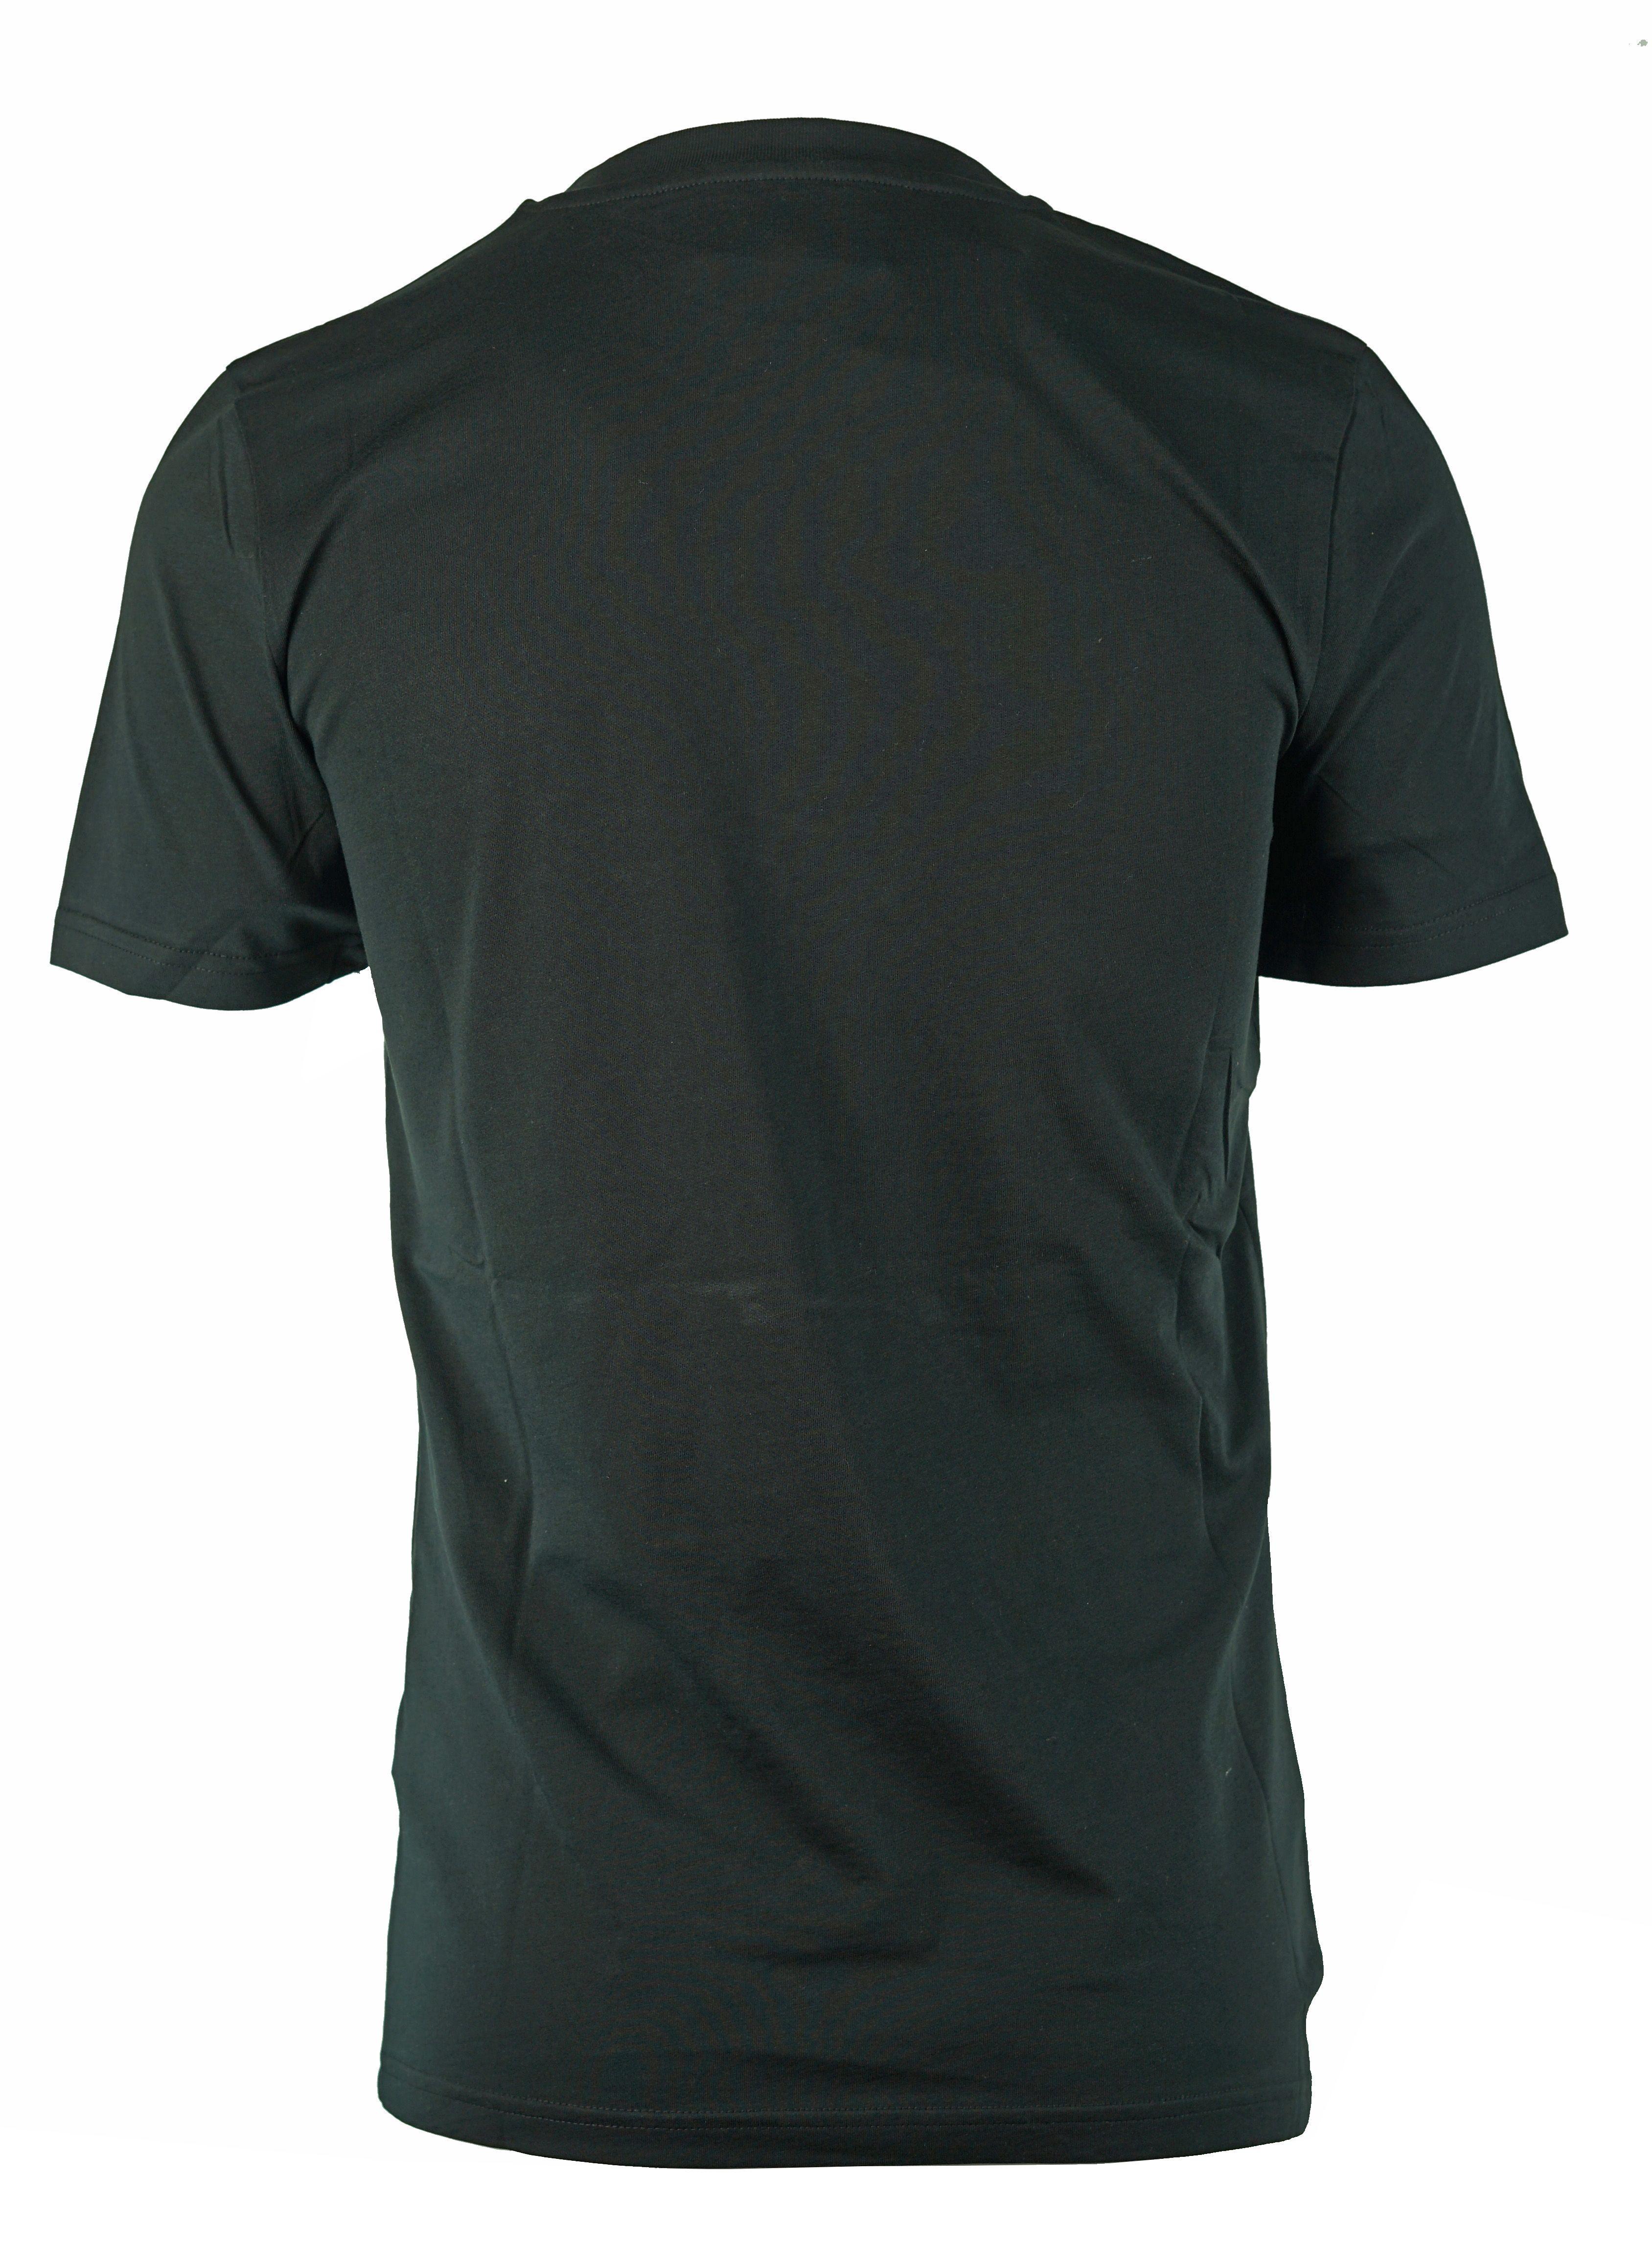 Moschino Z A0706 5240 1555 T-Shirt